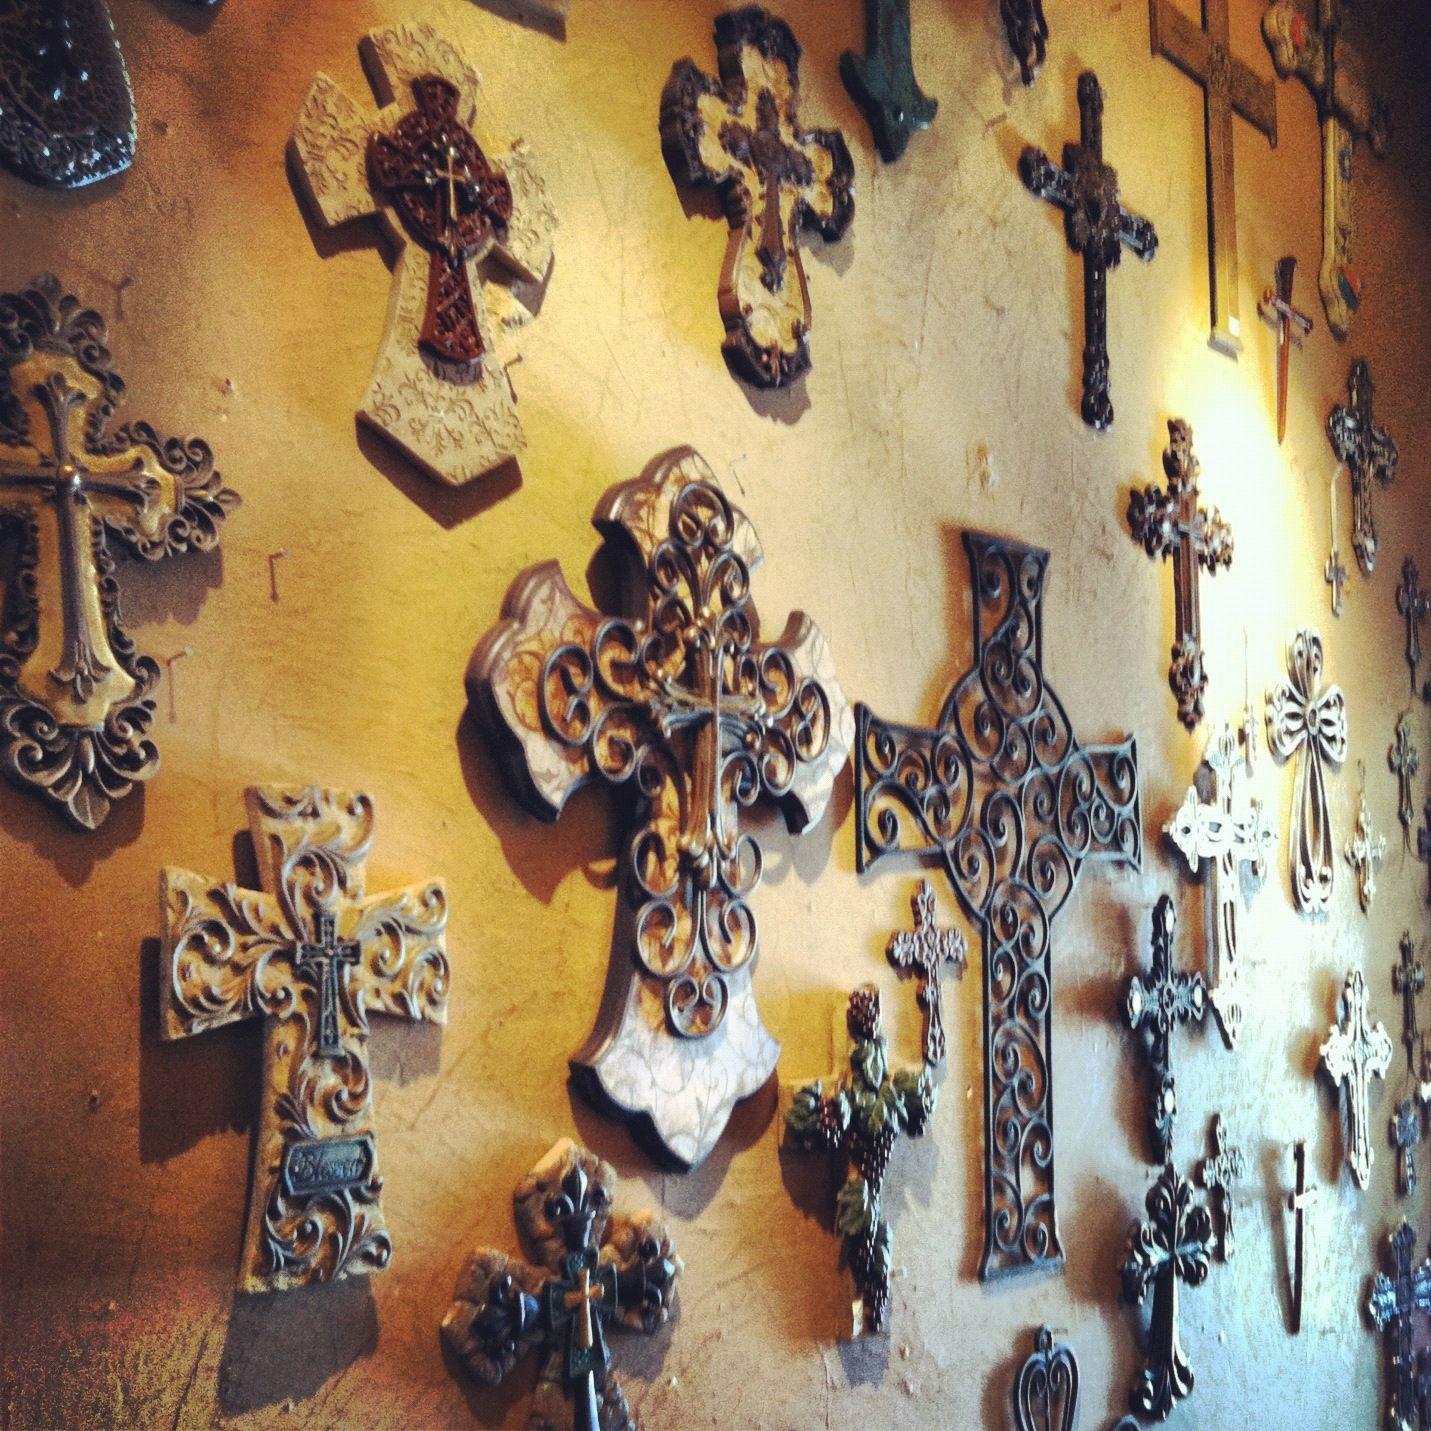 Wall of crosses | Crosses & crucifixes | Pinterest | Walls, Wall ...